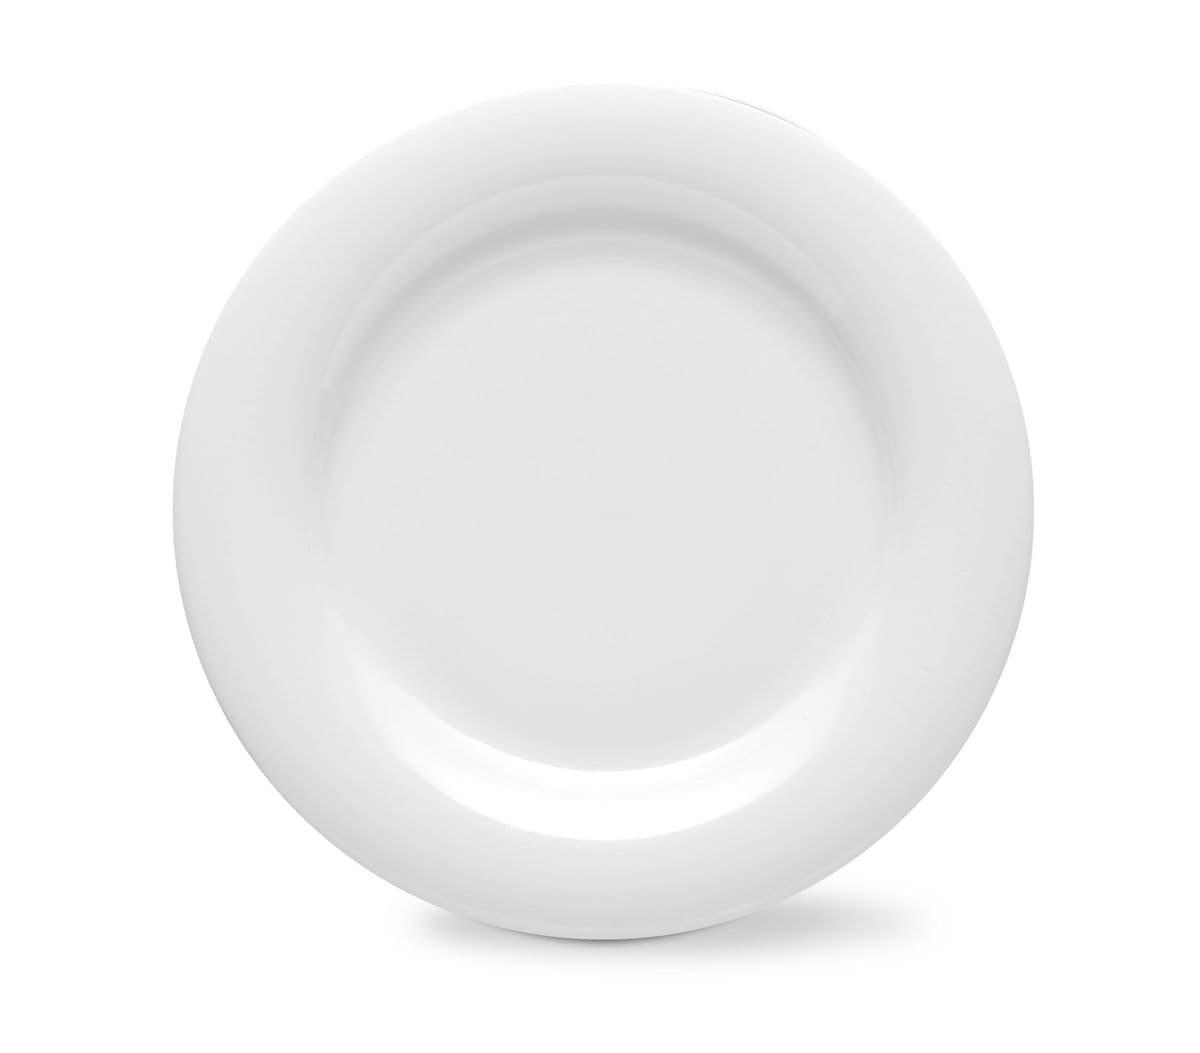 Cucina & Tavola COOL Dessertteller Teller